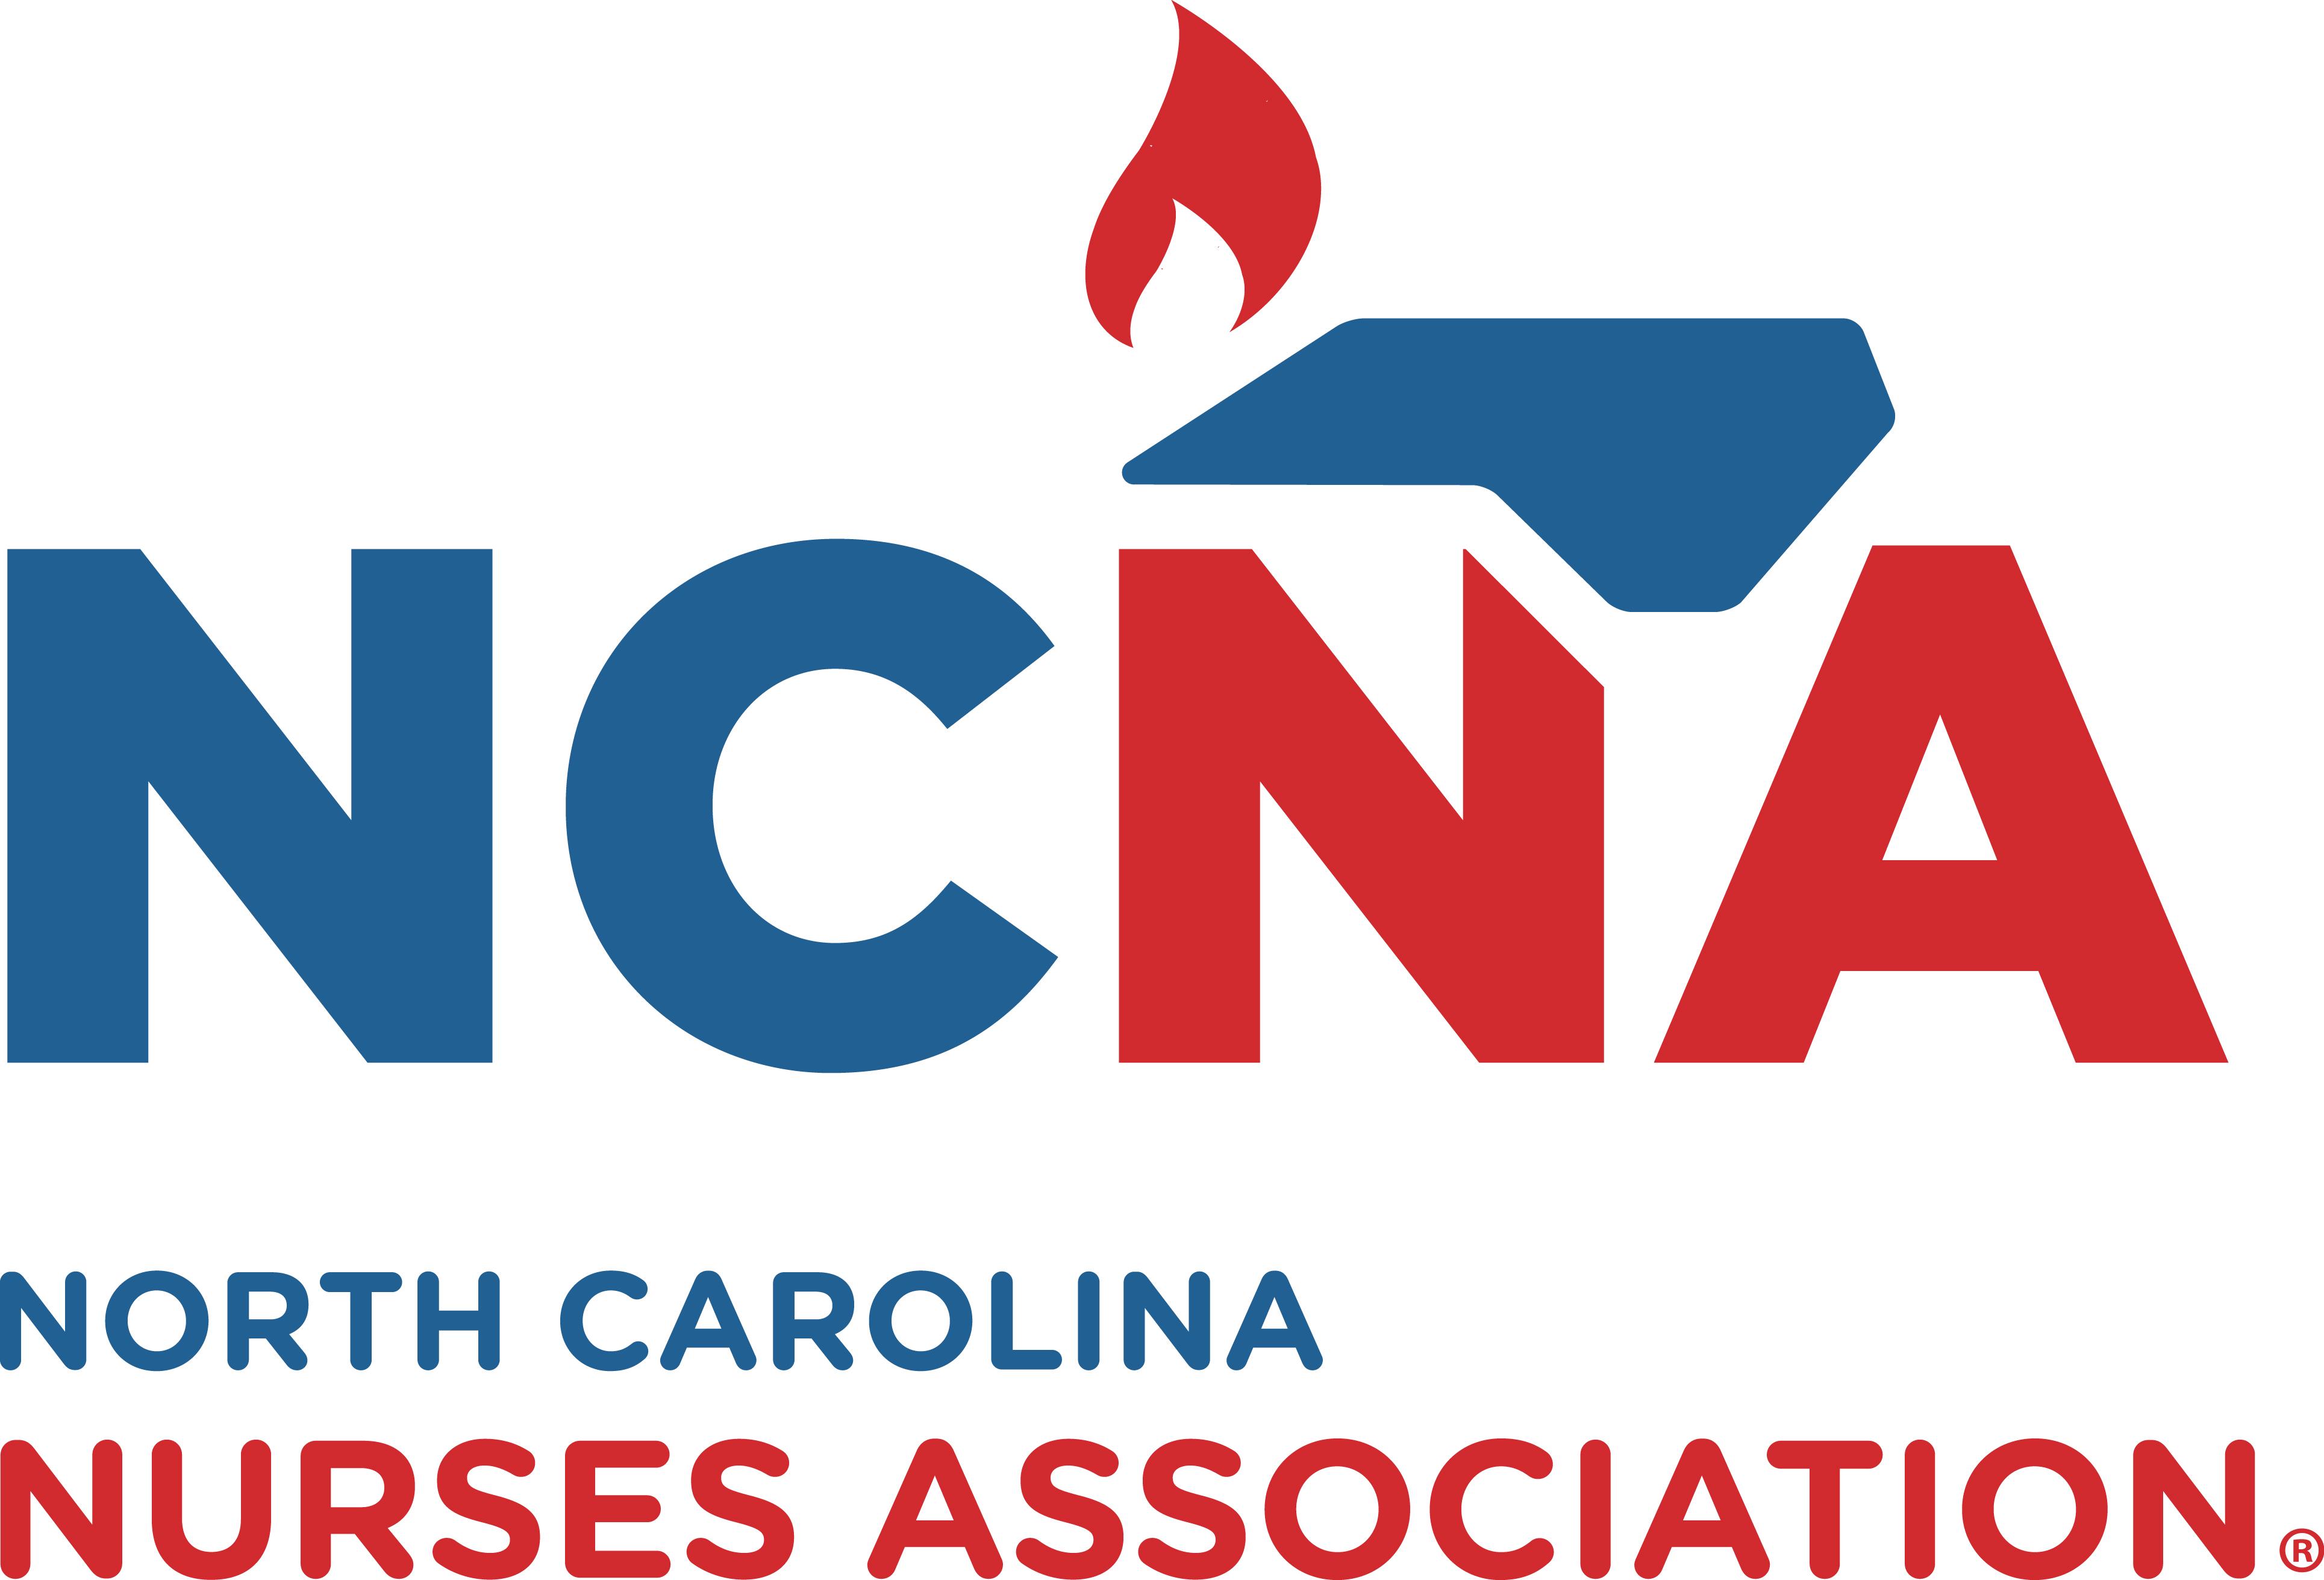 North Carolina Nurses Association